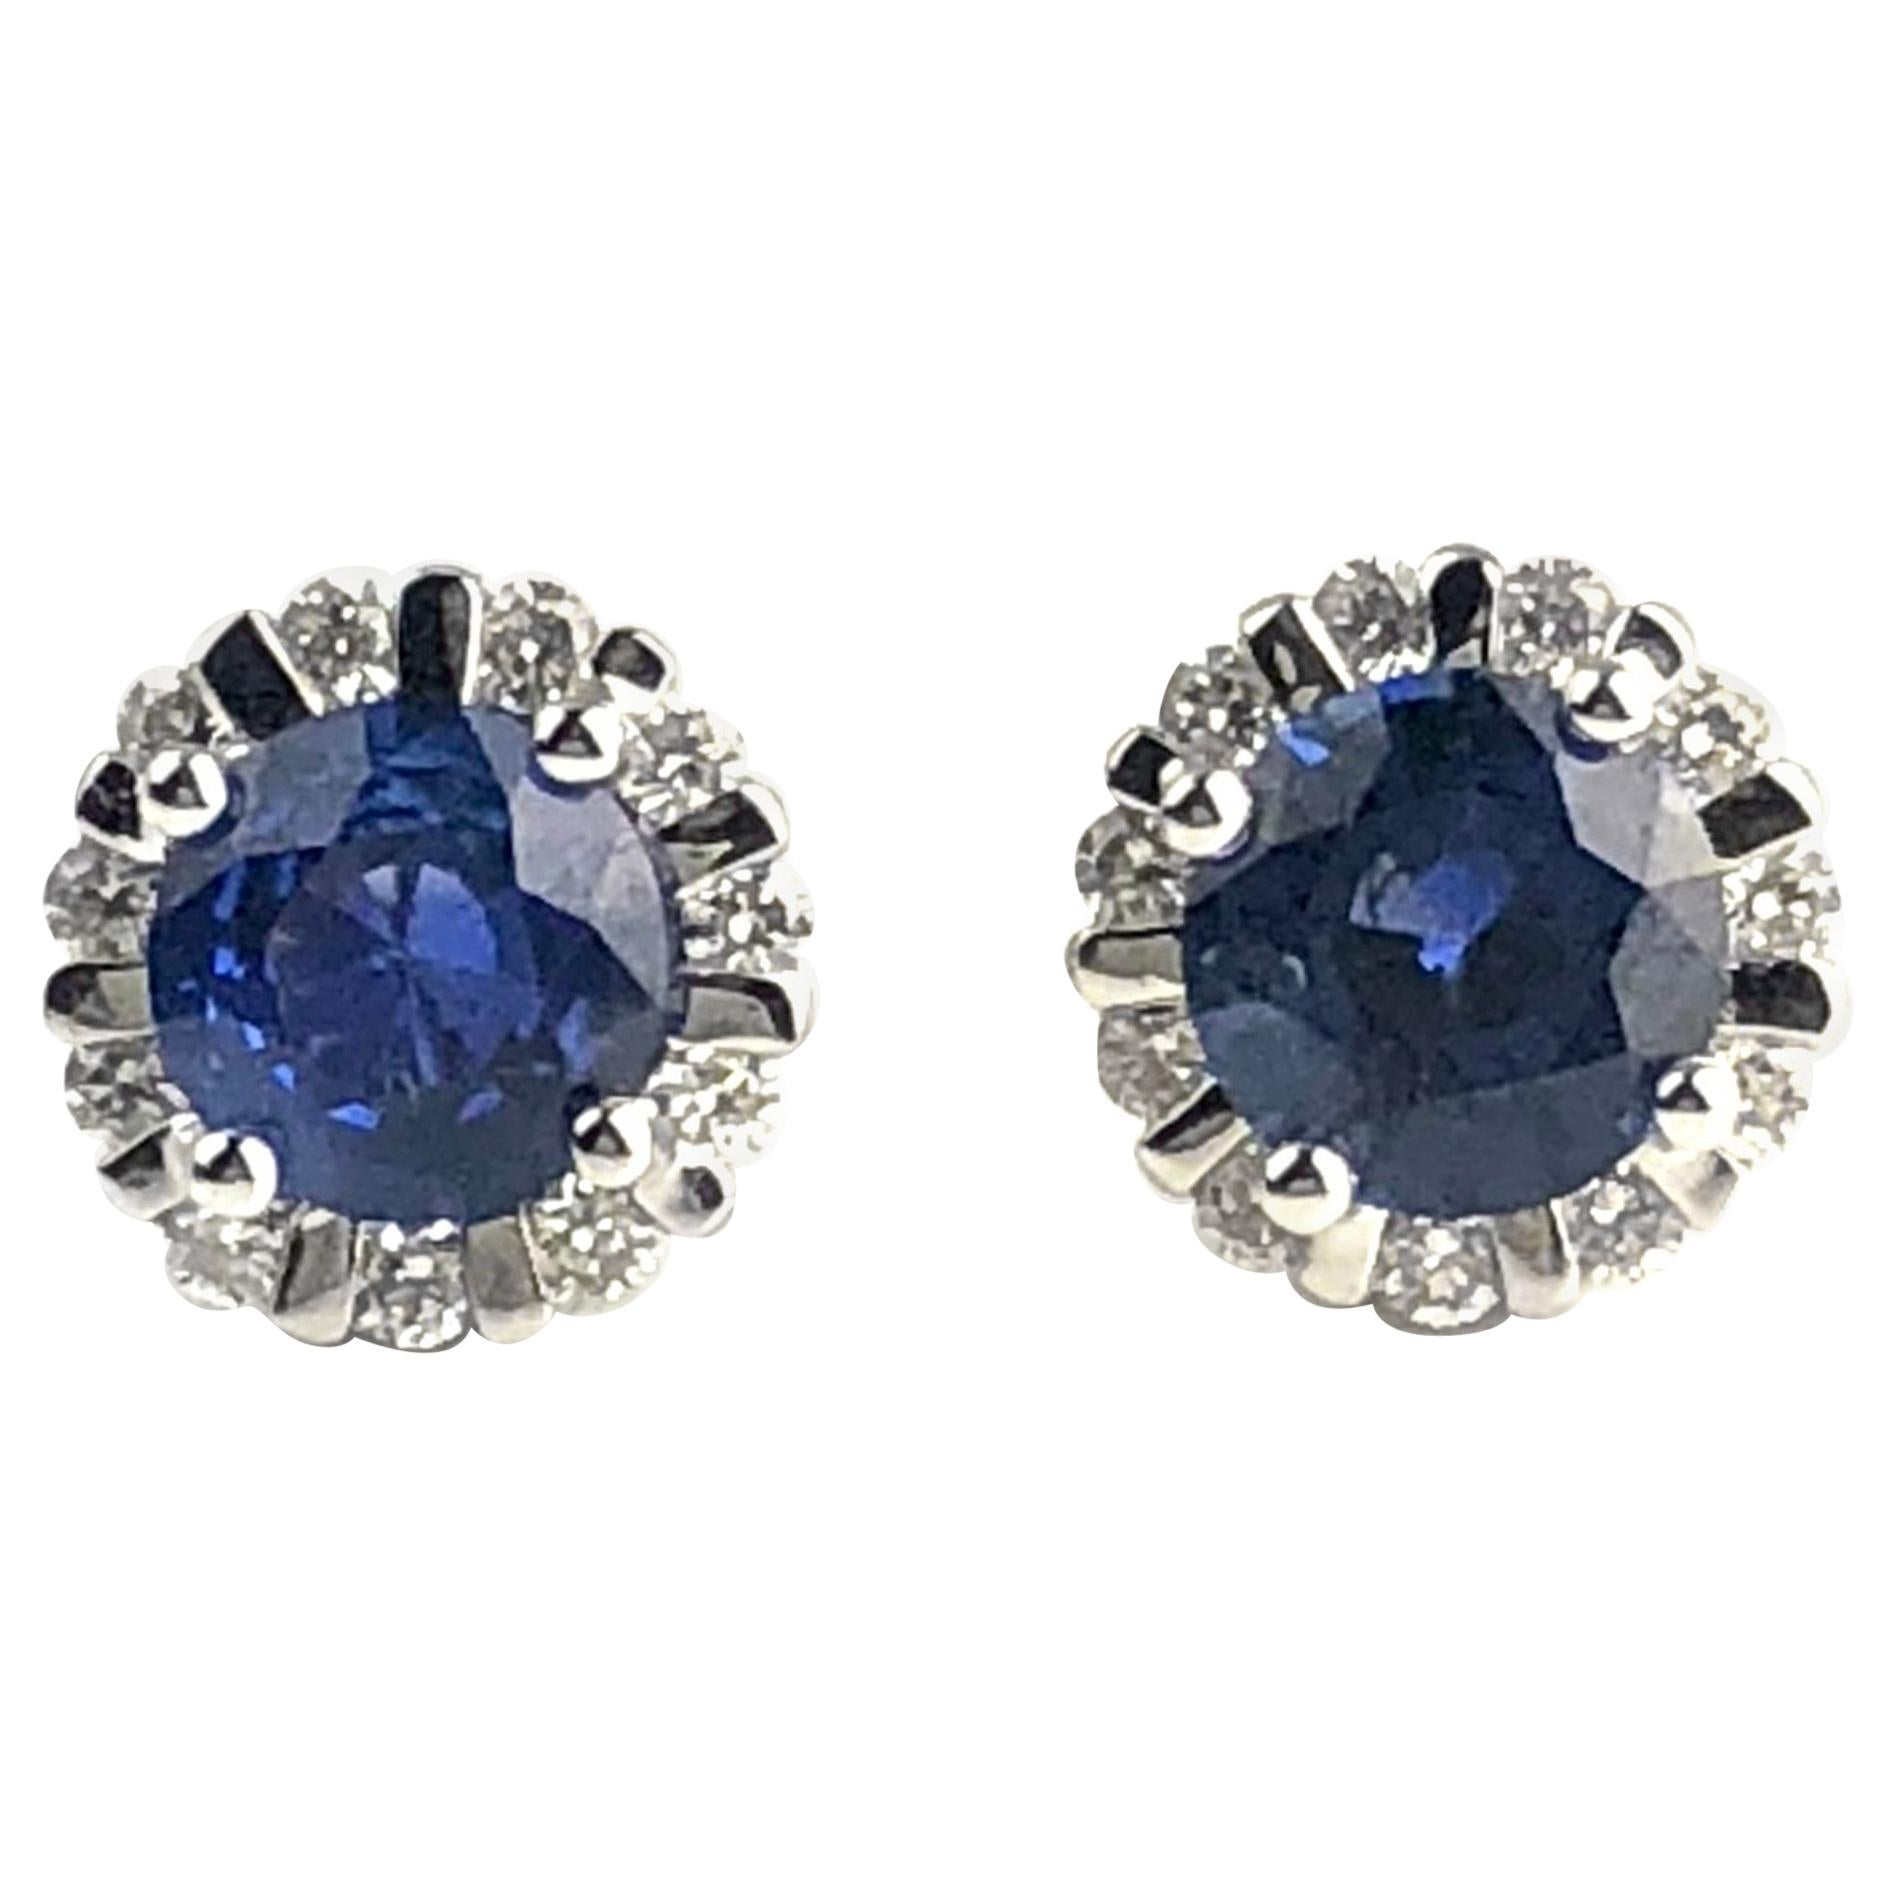 DiamondTown 1.85 Carat Round Blue Sapphire Earrings in Diamond Halo in 18K Gold